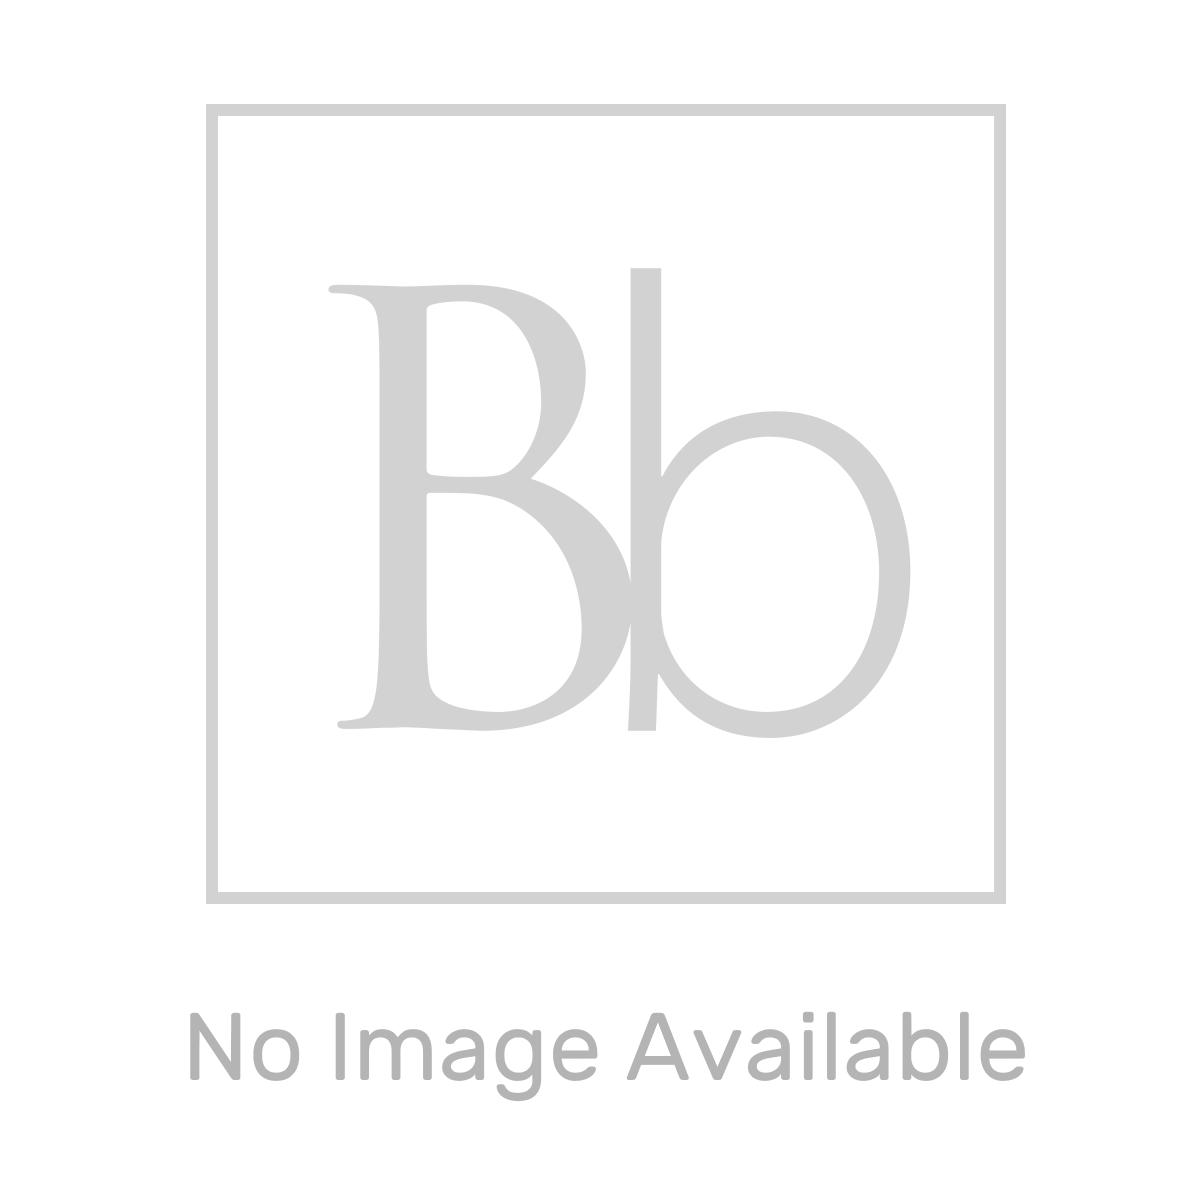 Sensio Ainsley Single Door LED Cabinet Mirror 700 x 564 x 126 4